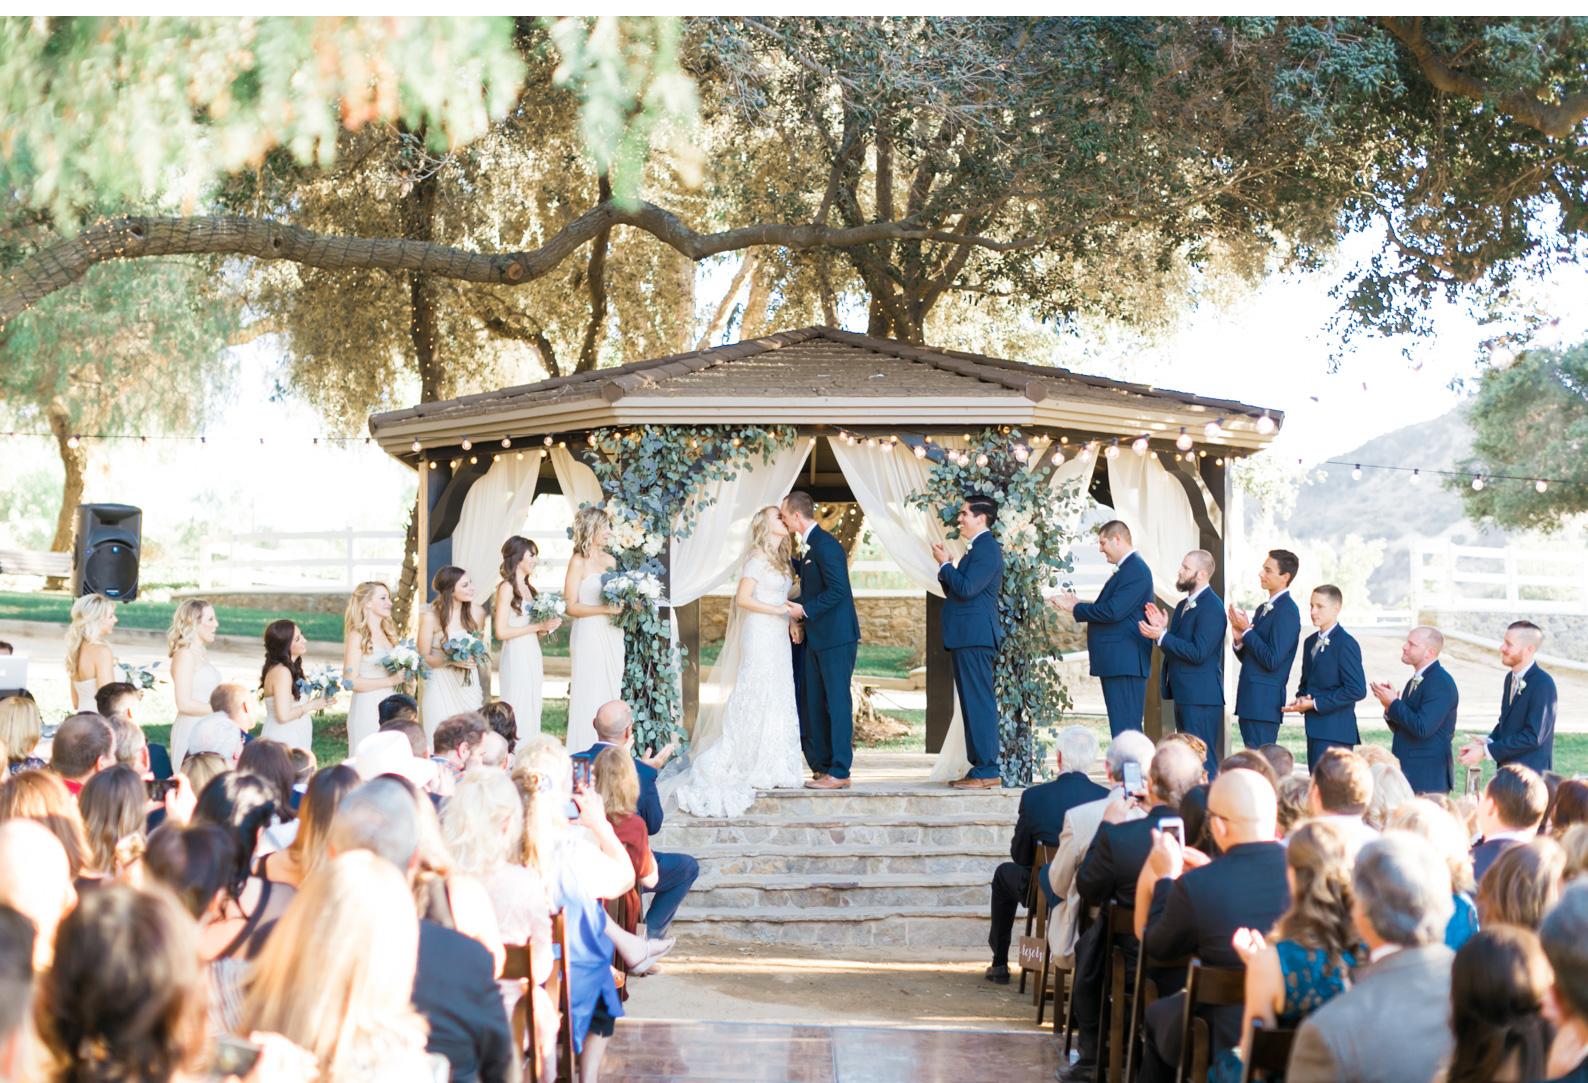 Style-Me-Pretty-Wedding-Photographer-Natalie-Schutt-Photography-Calfornia-San-Luis-Obispo_06.jpg